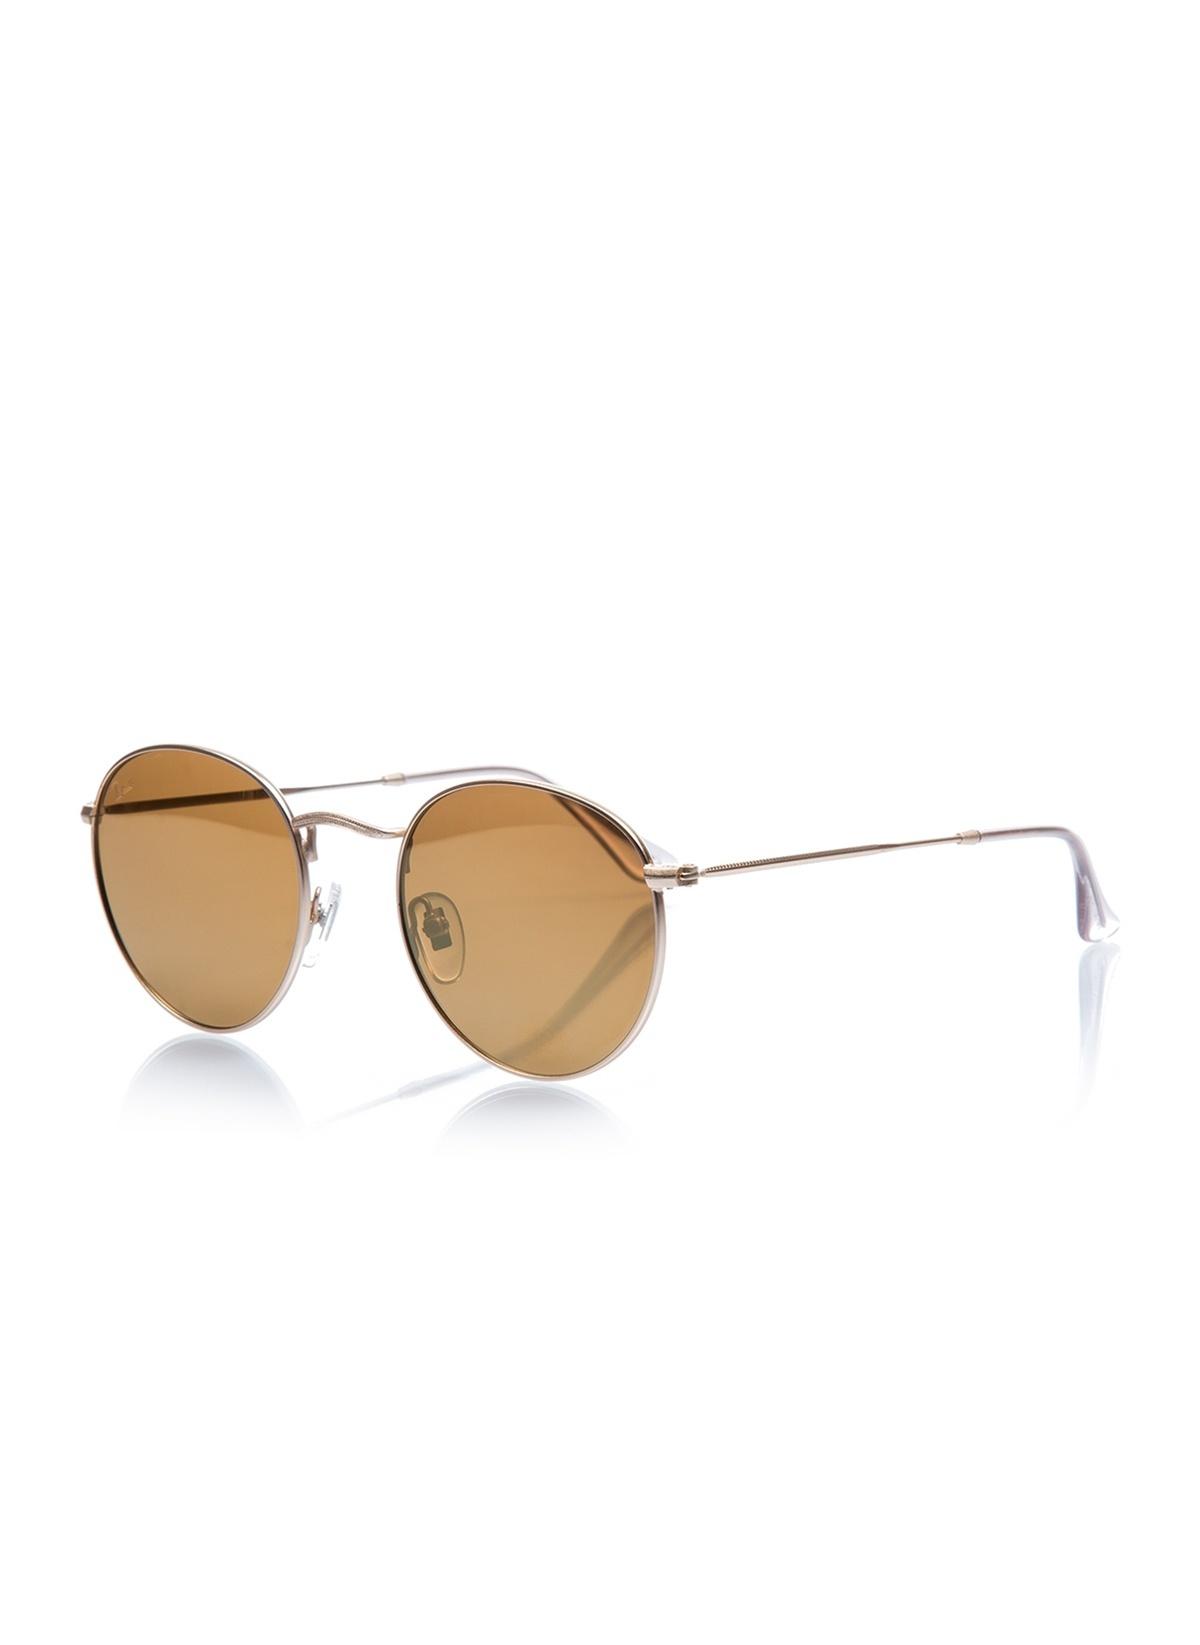 İnfiniti Design Güneş Gözlüğü Id 3447 04 Flat 07 Güneş Gözlüğü – 159.99 TL